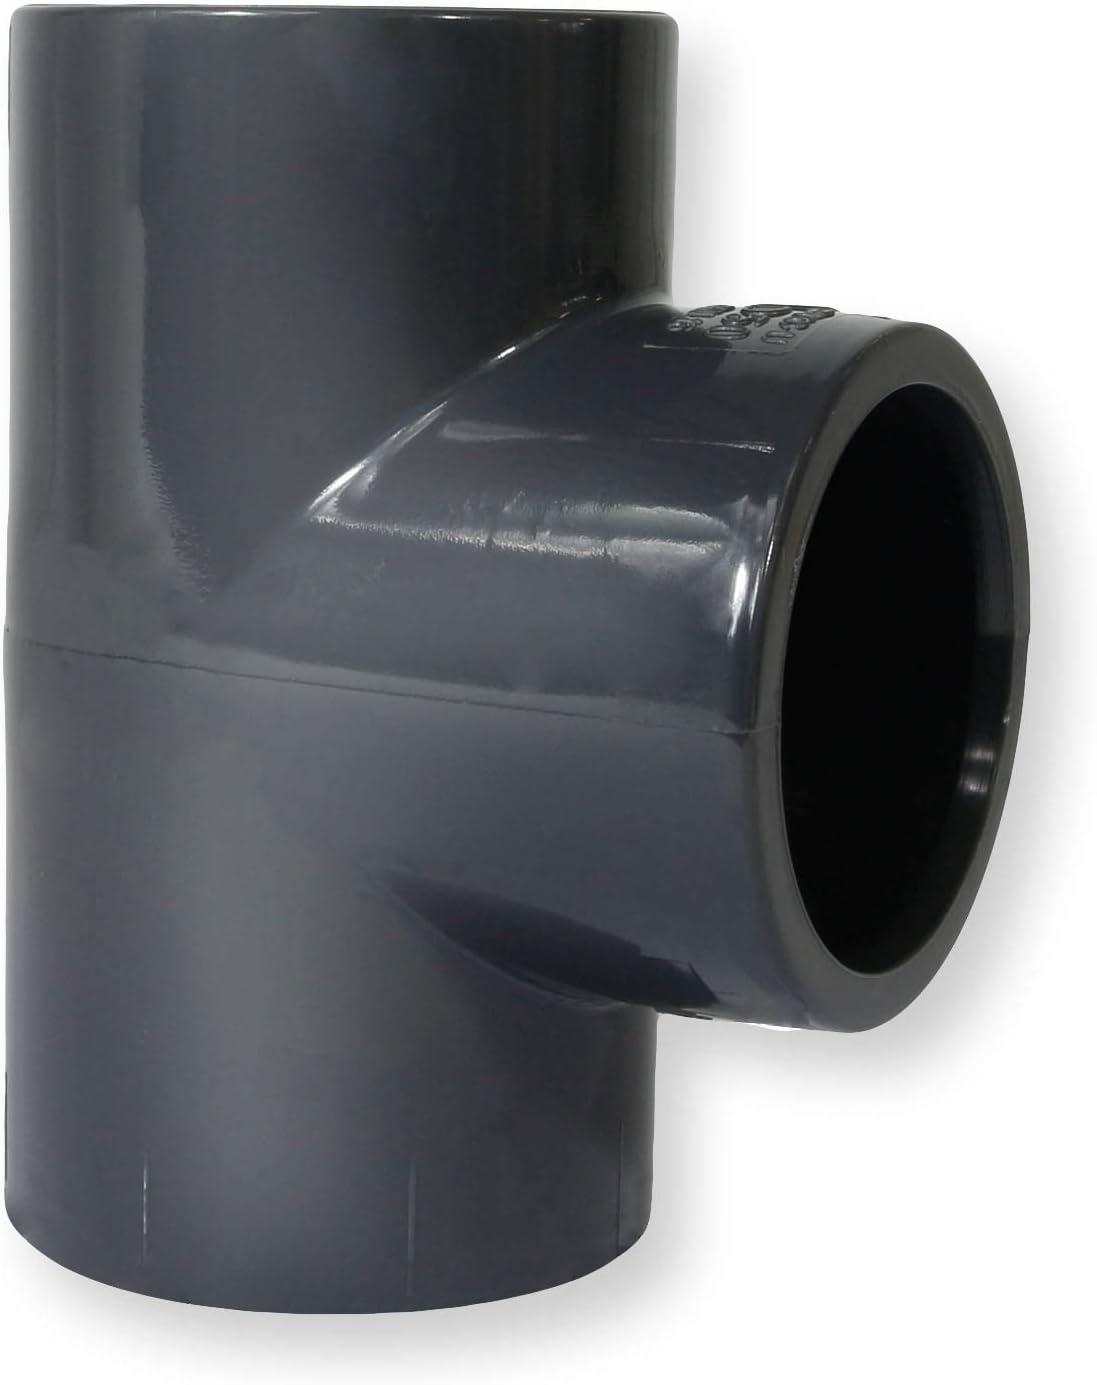 2 St/ück Paradies Pool PVC Fitting T-St/ück /Ø 50mm 90/° mit Klebemuffen Qualit/ät aus Europa Menge